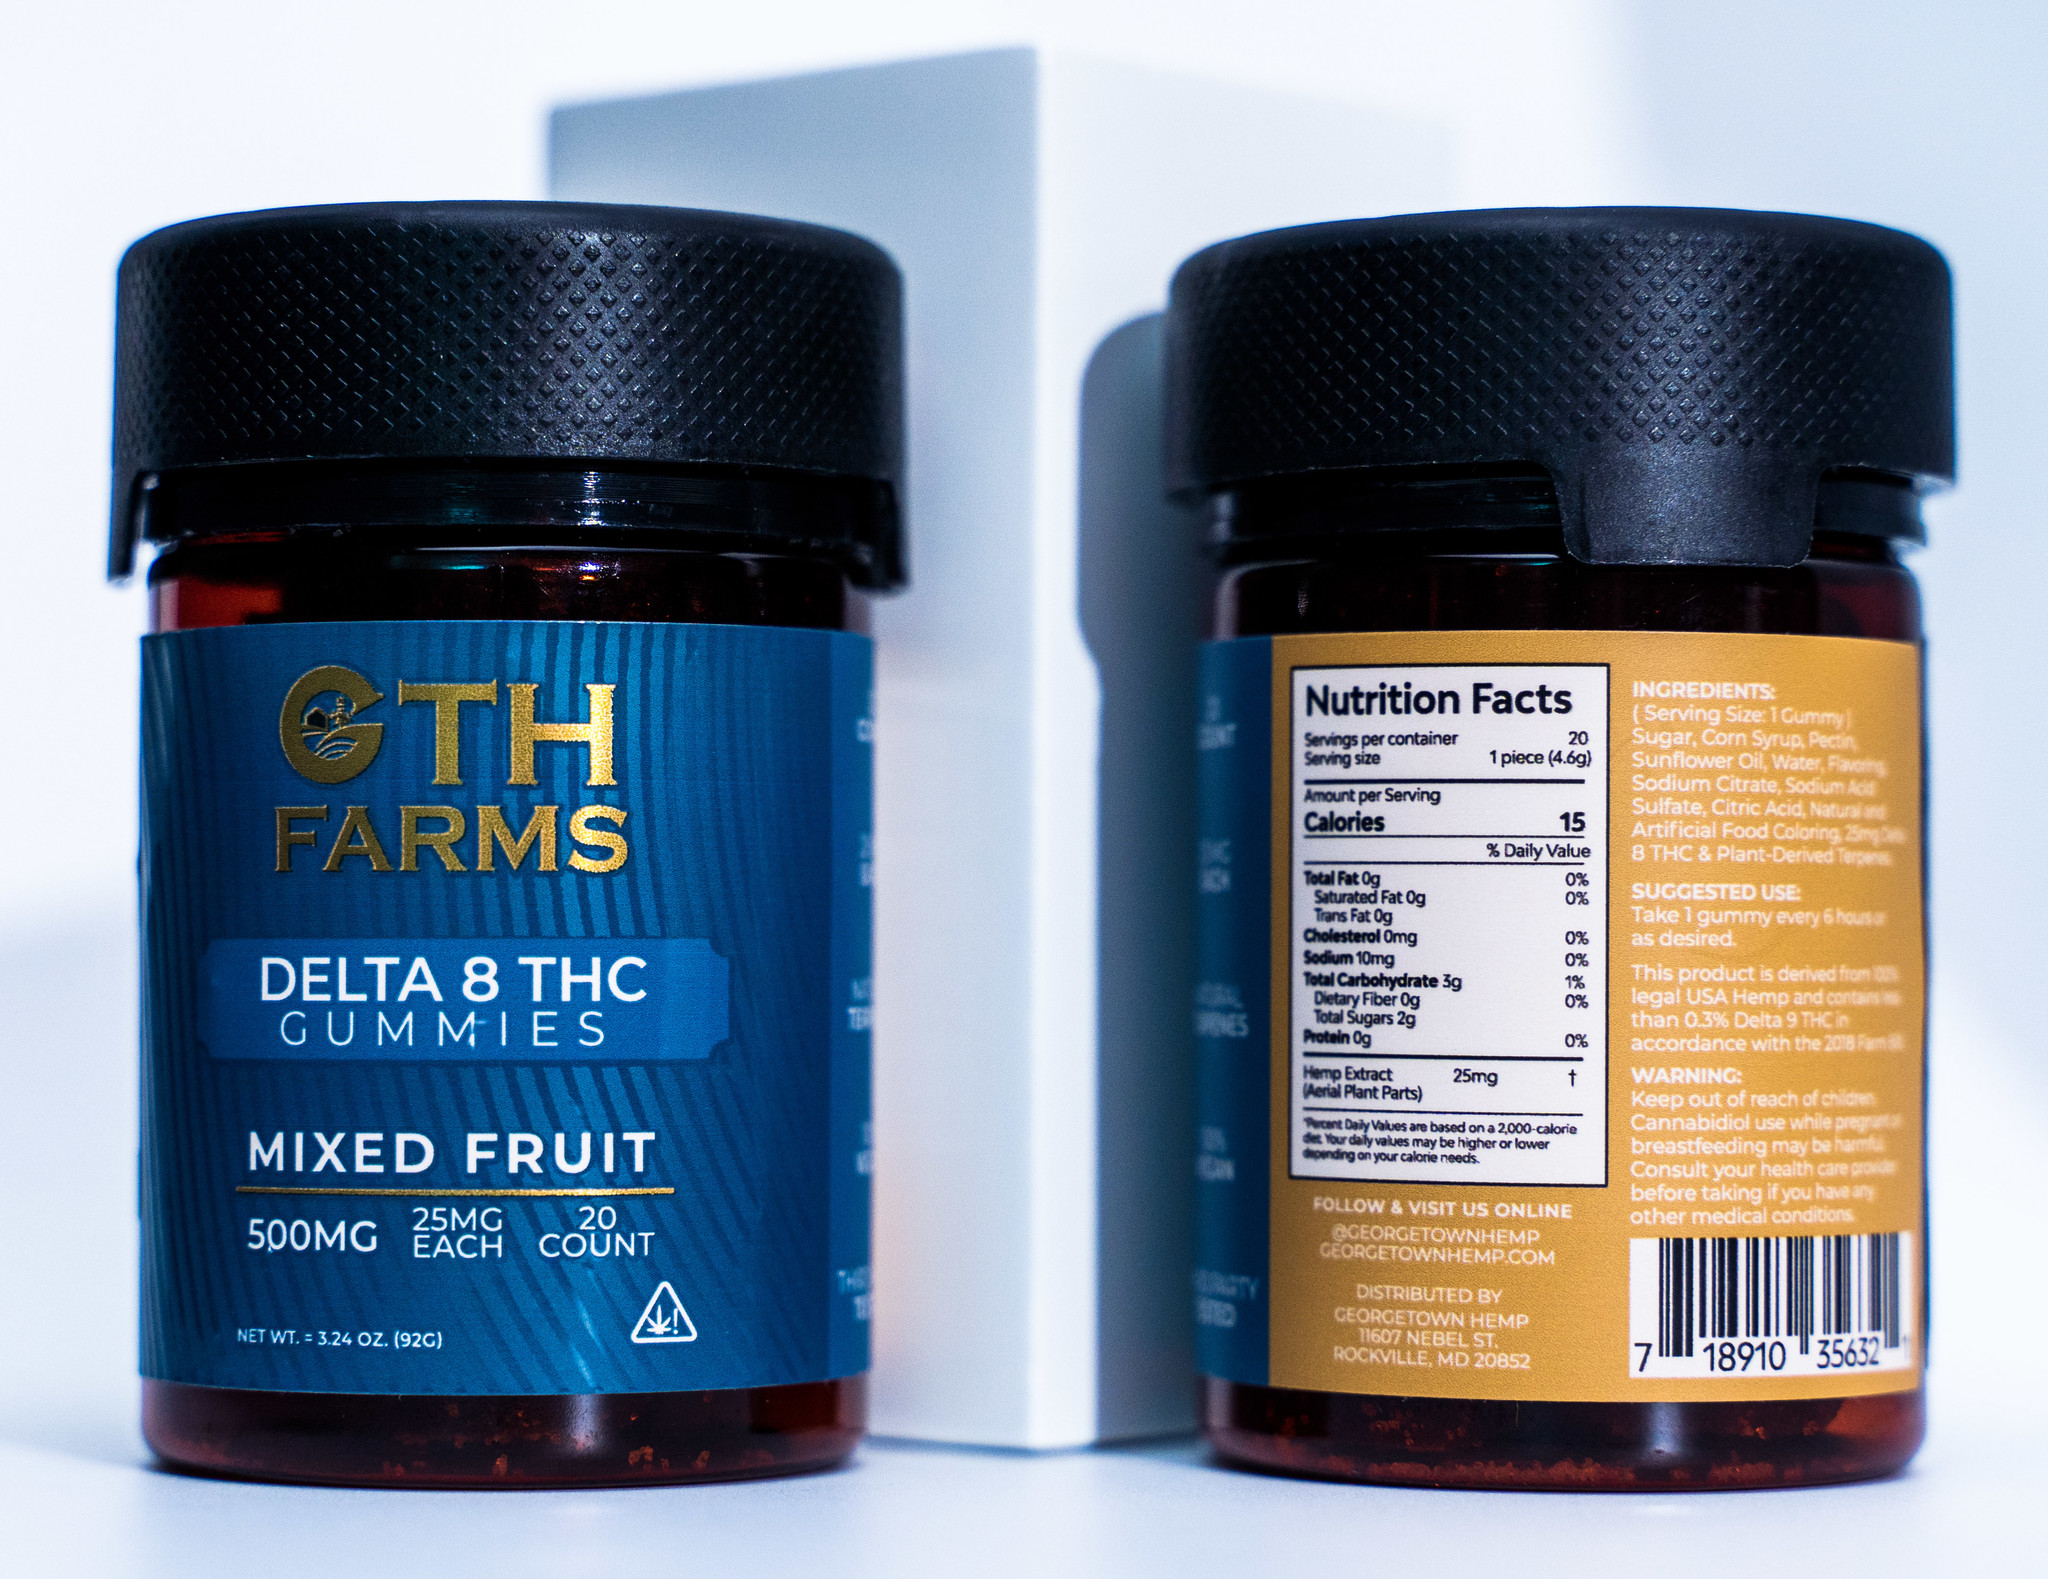 Georgetown Hemp GTH | DELTA 8 GUMMIES | MIXED FRUITS | 25mg Per Gummy | 20 COUNT